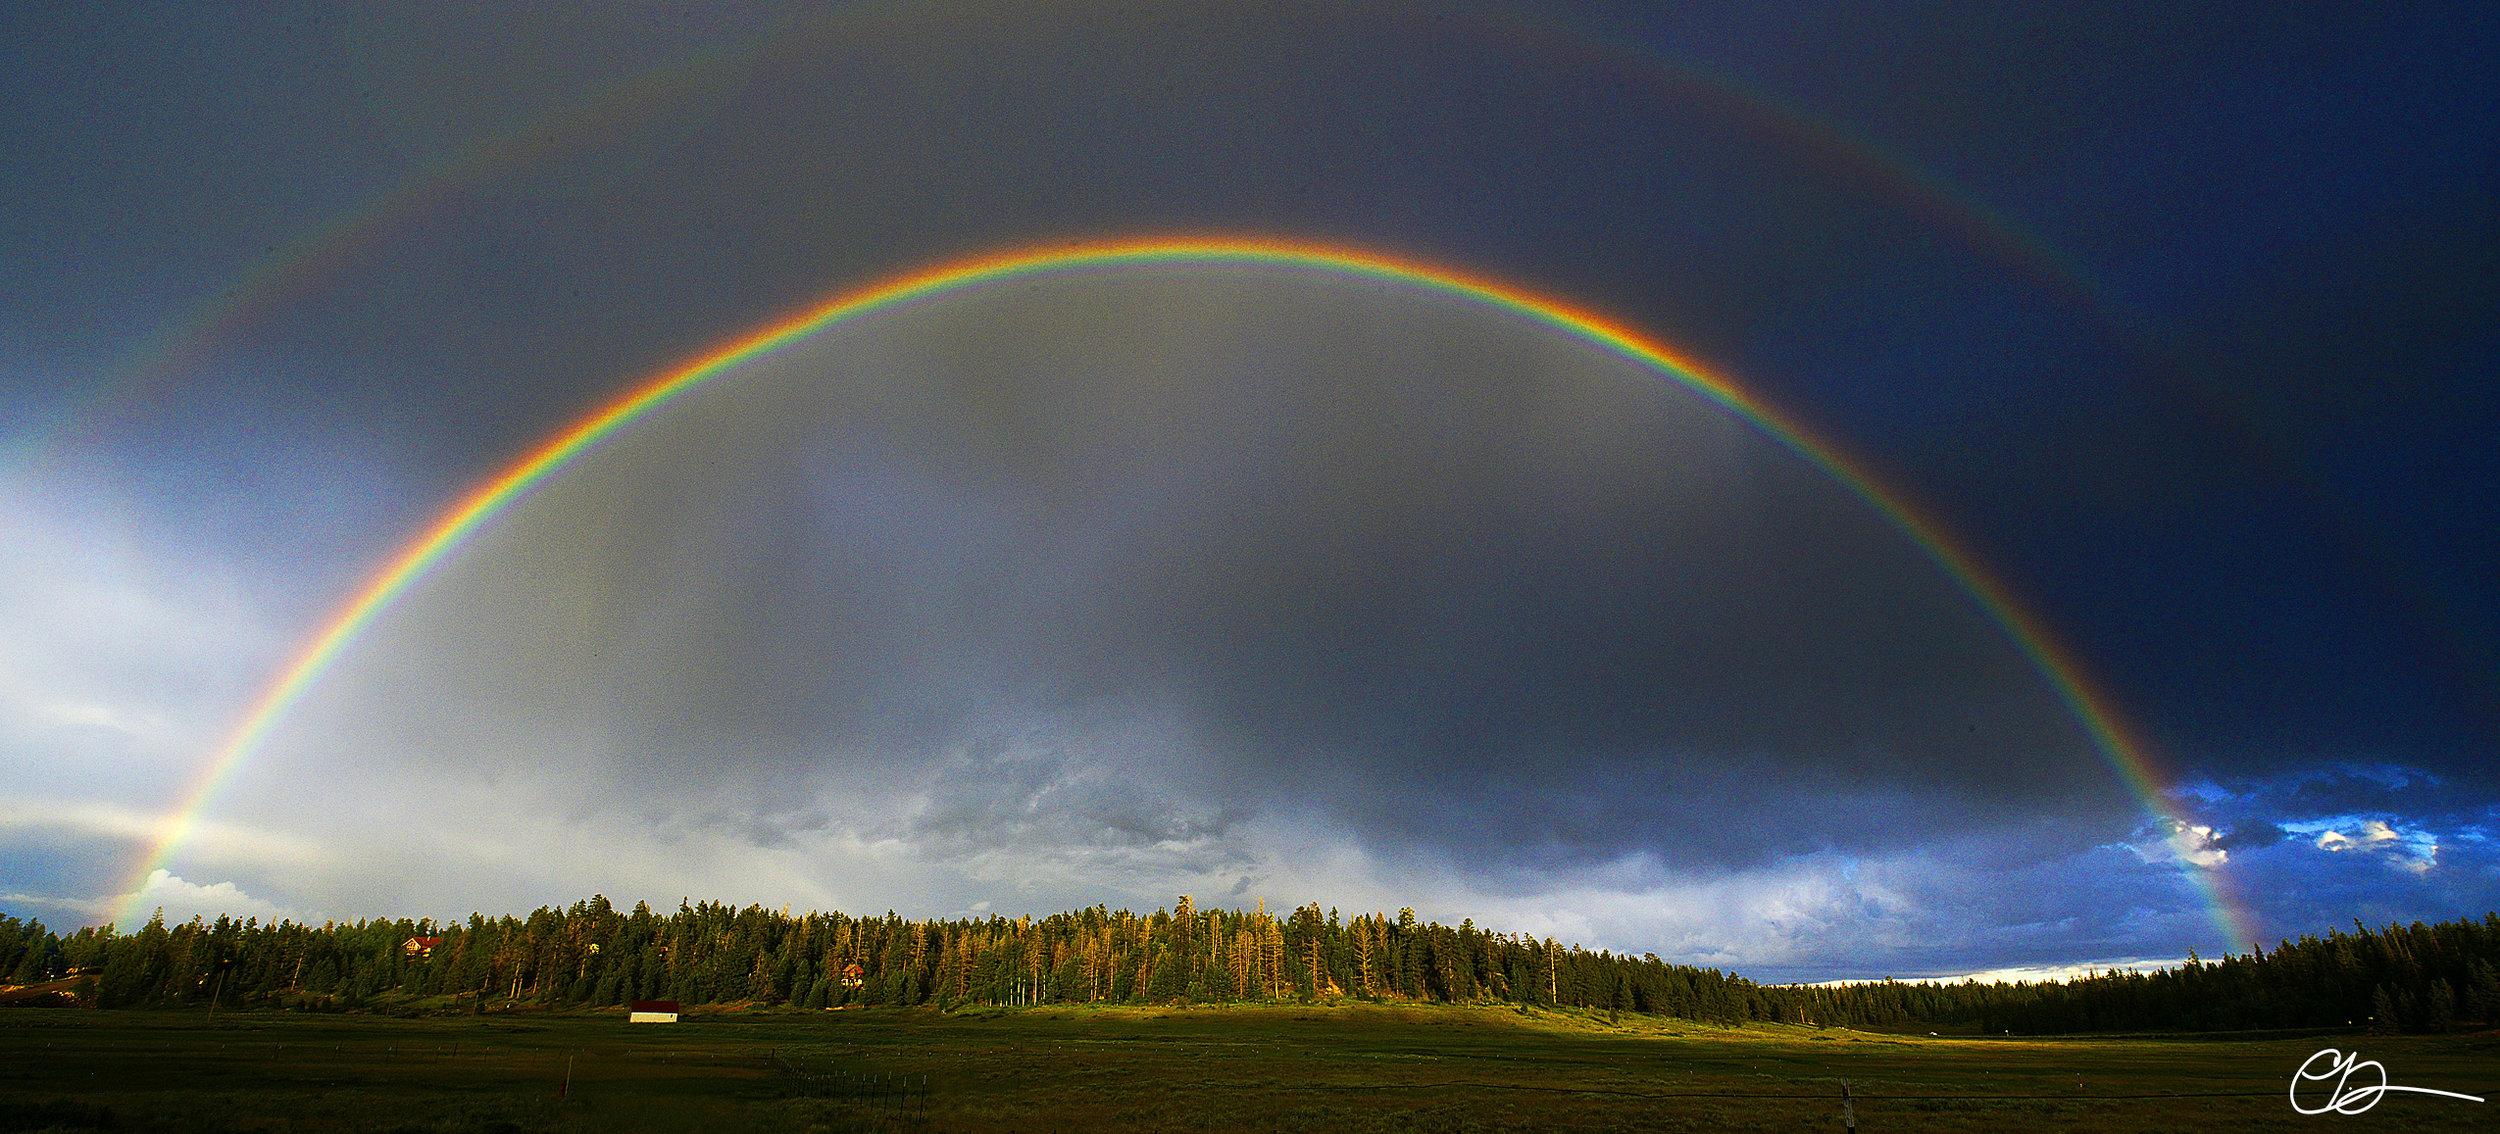 UT-DC-2383940-CDCOMP Duck Creek Rainbow.jpg